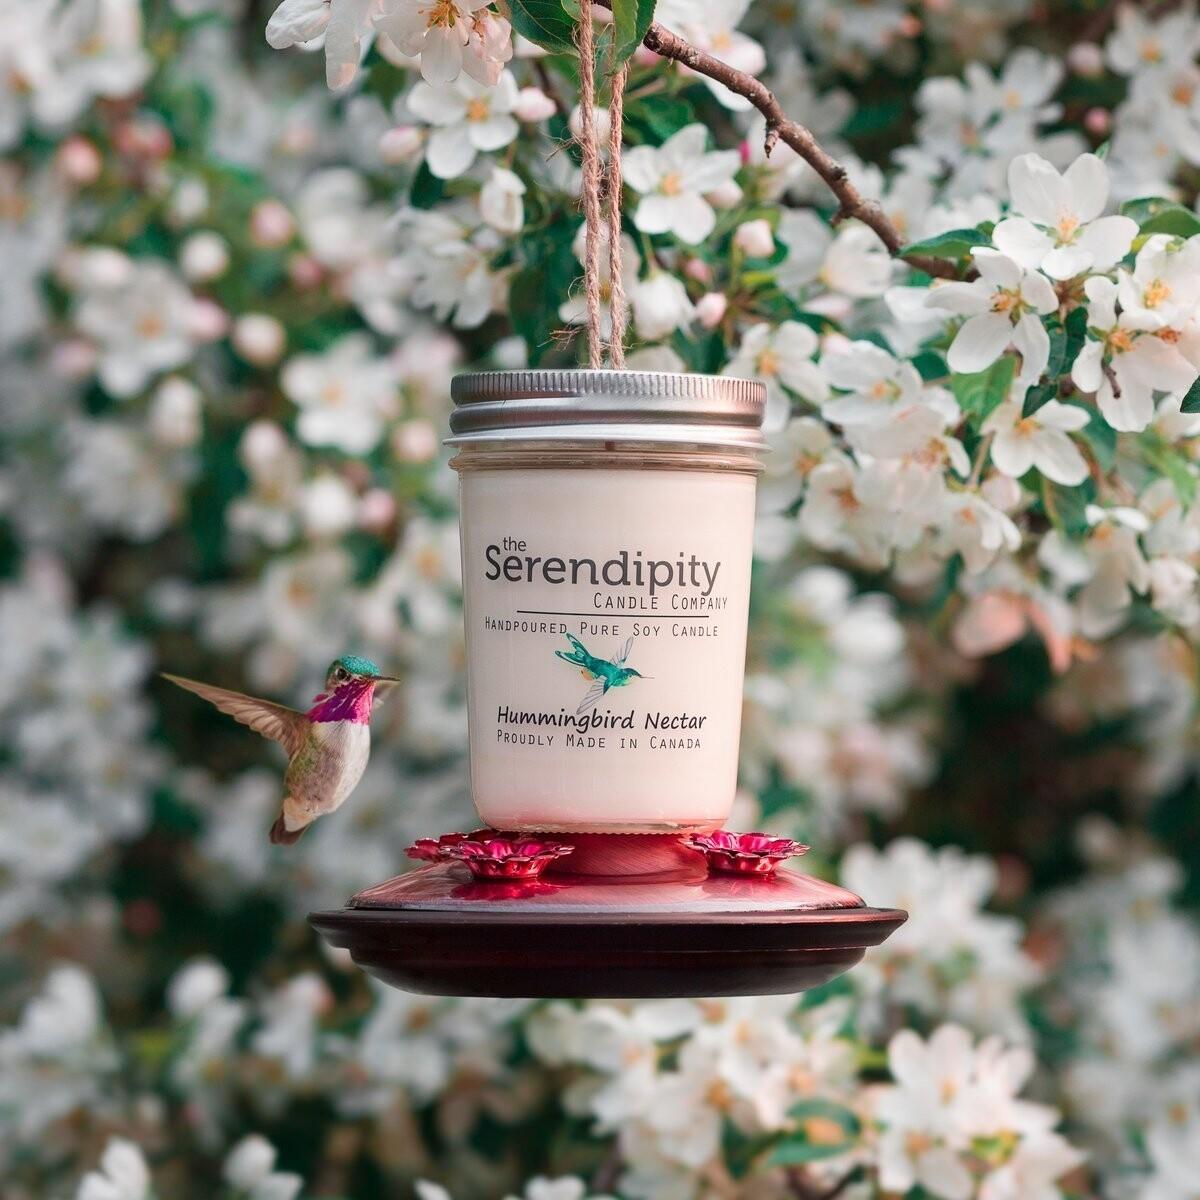 Serendipity 8 oz Soy Candle Jar | Hummingbird Nectar